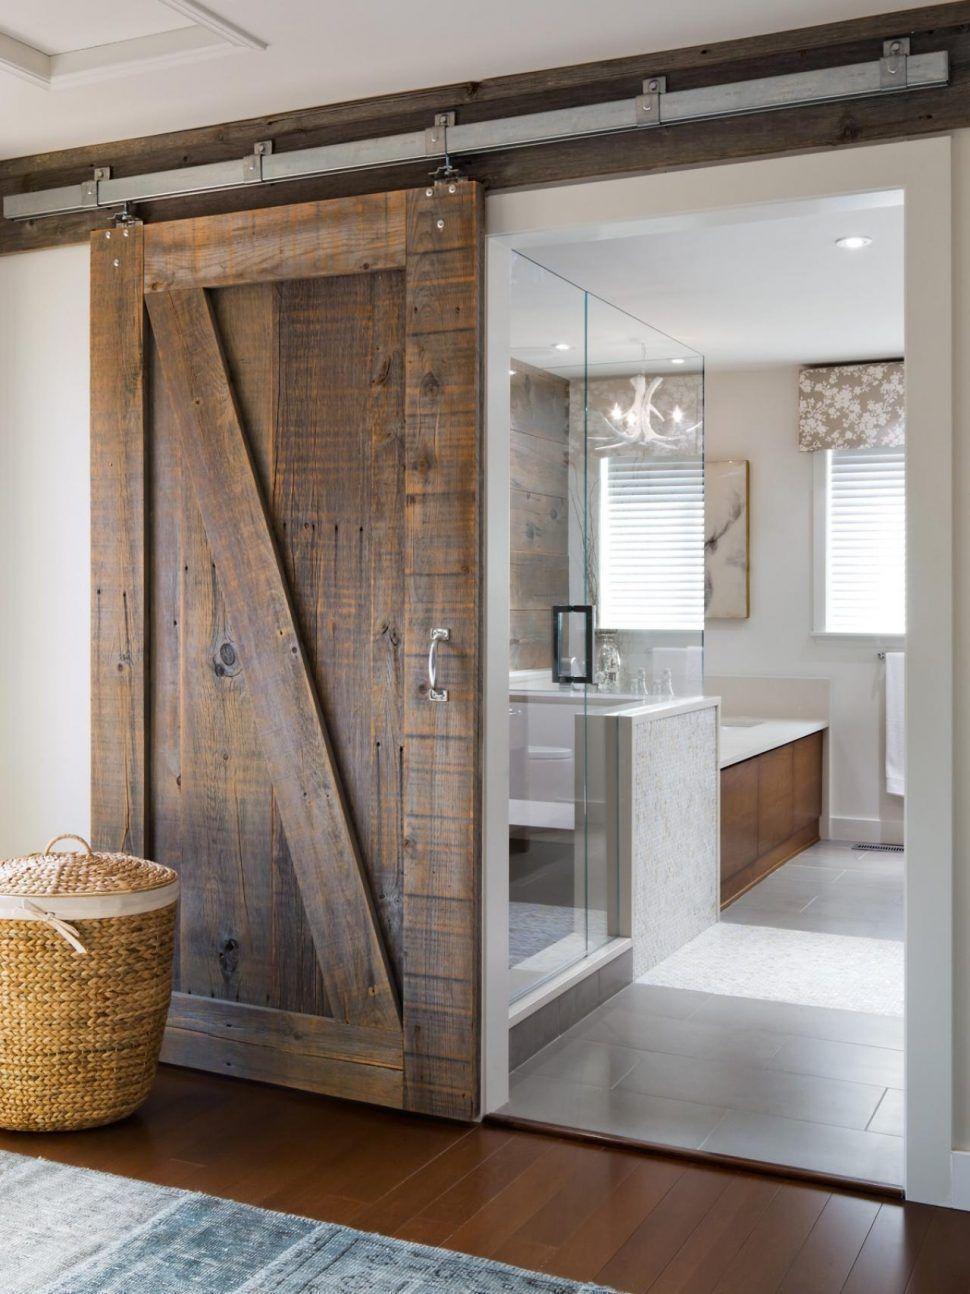 Bathrooms Designelegant How To Make Interior Sliding Barn Doors